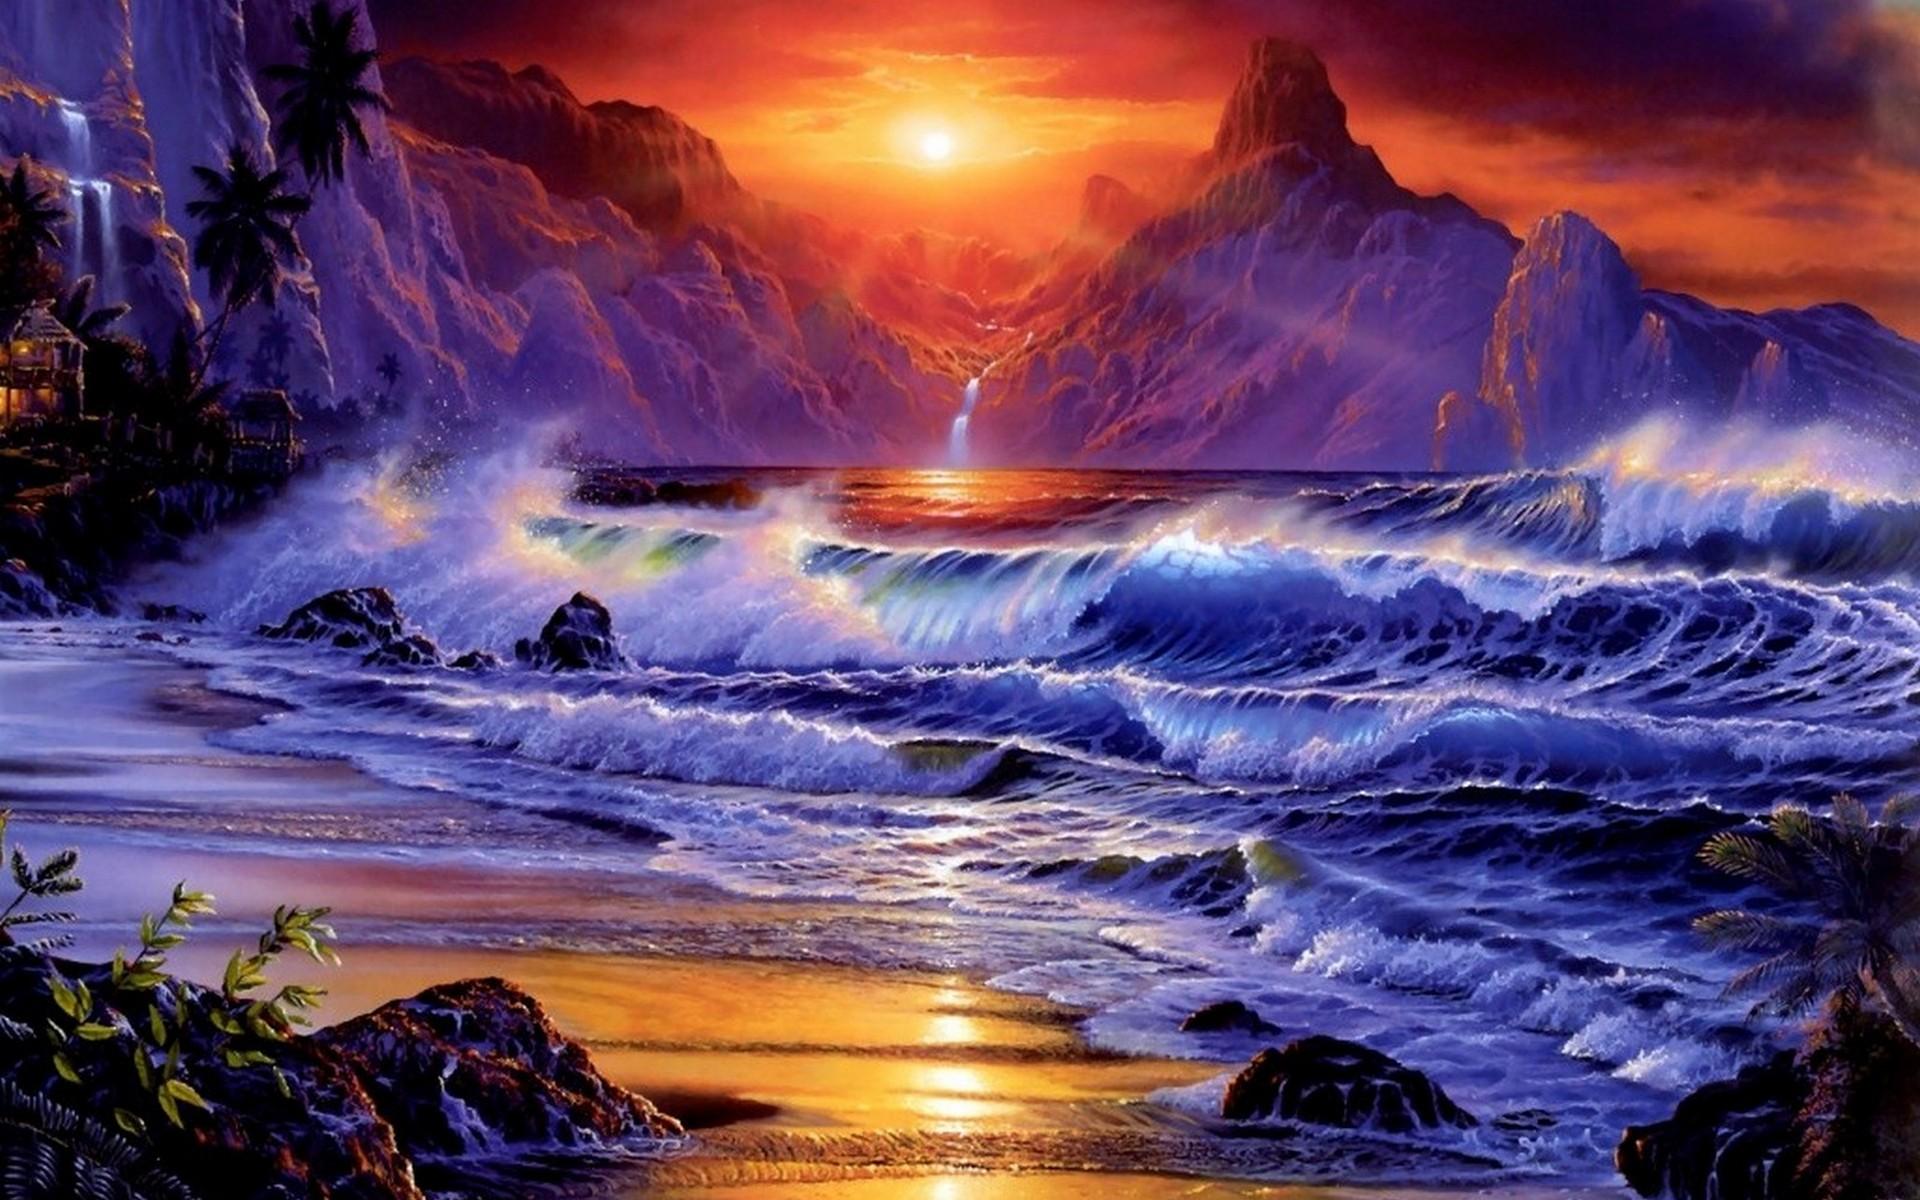 Sunsets Ocean Wallpaper 1920x1200 Sunsets Ocean Waves Fantasy Art 1920x1200